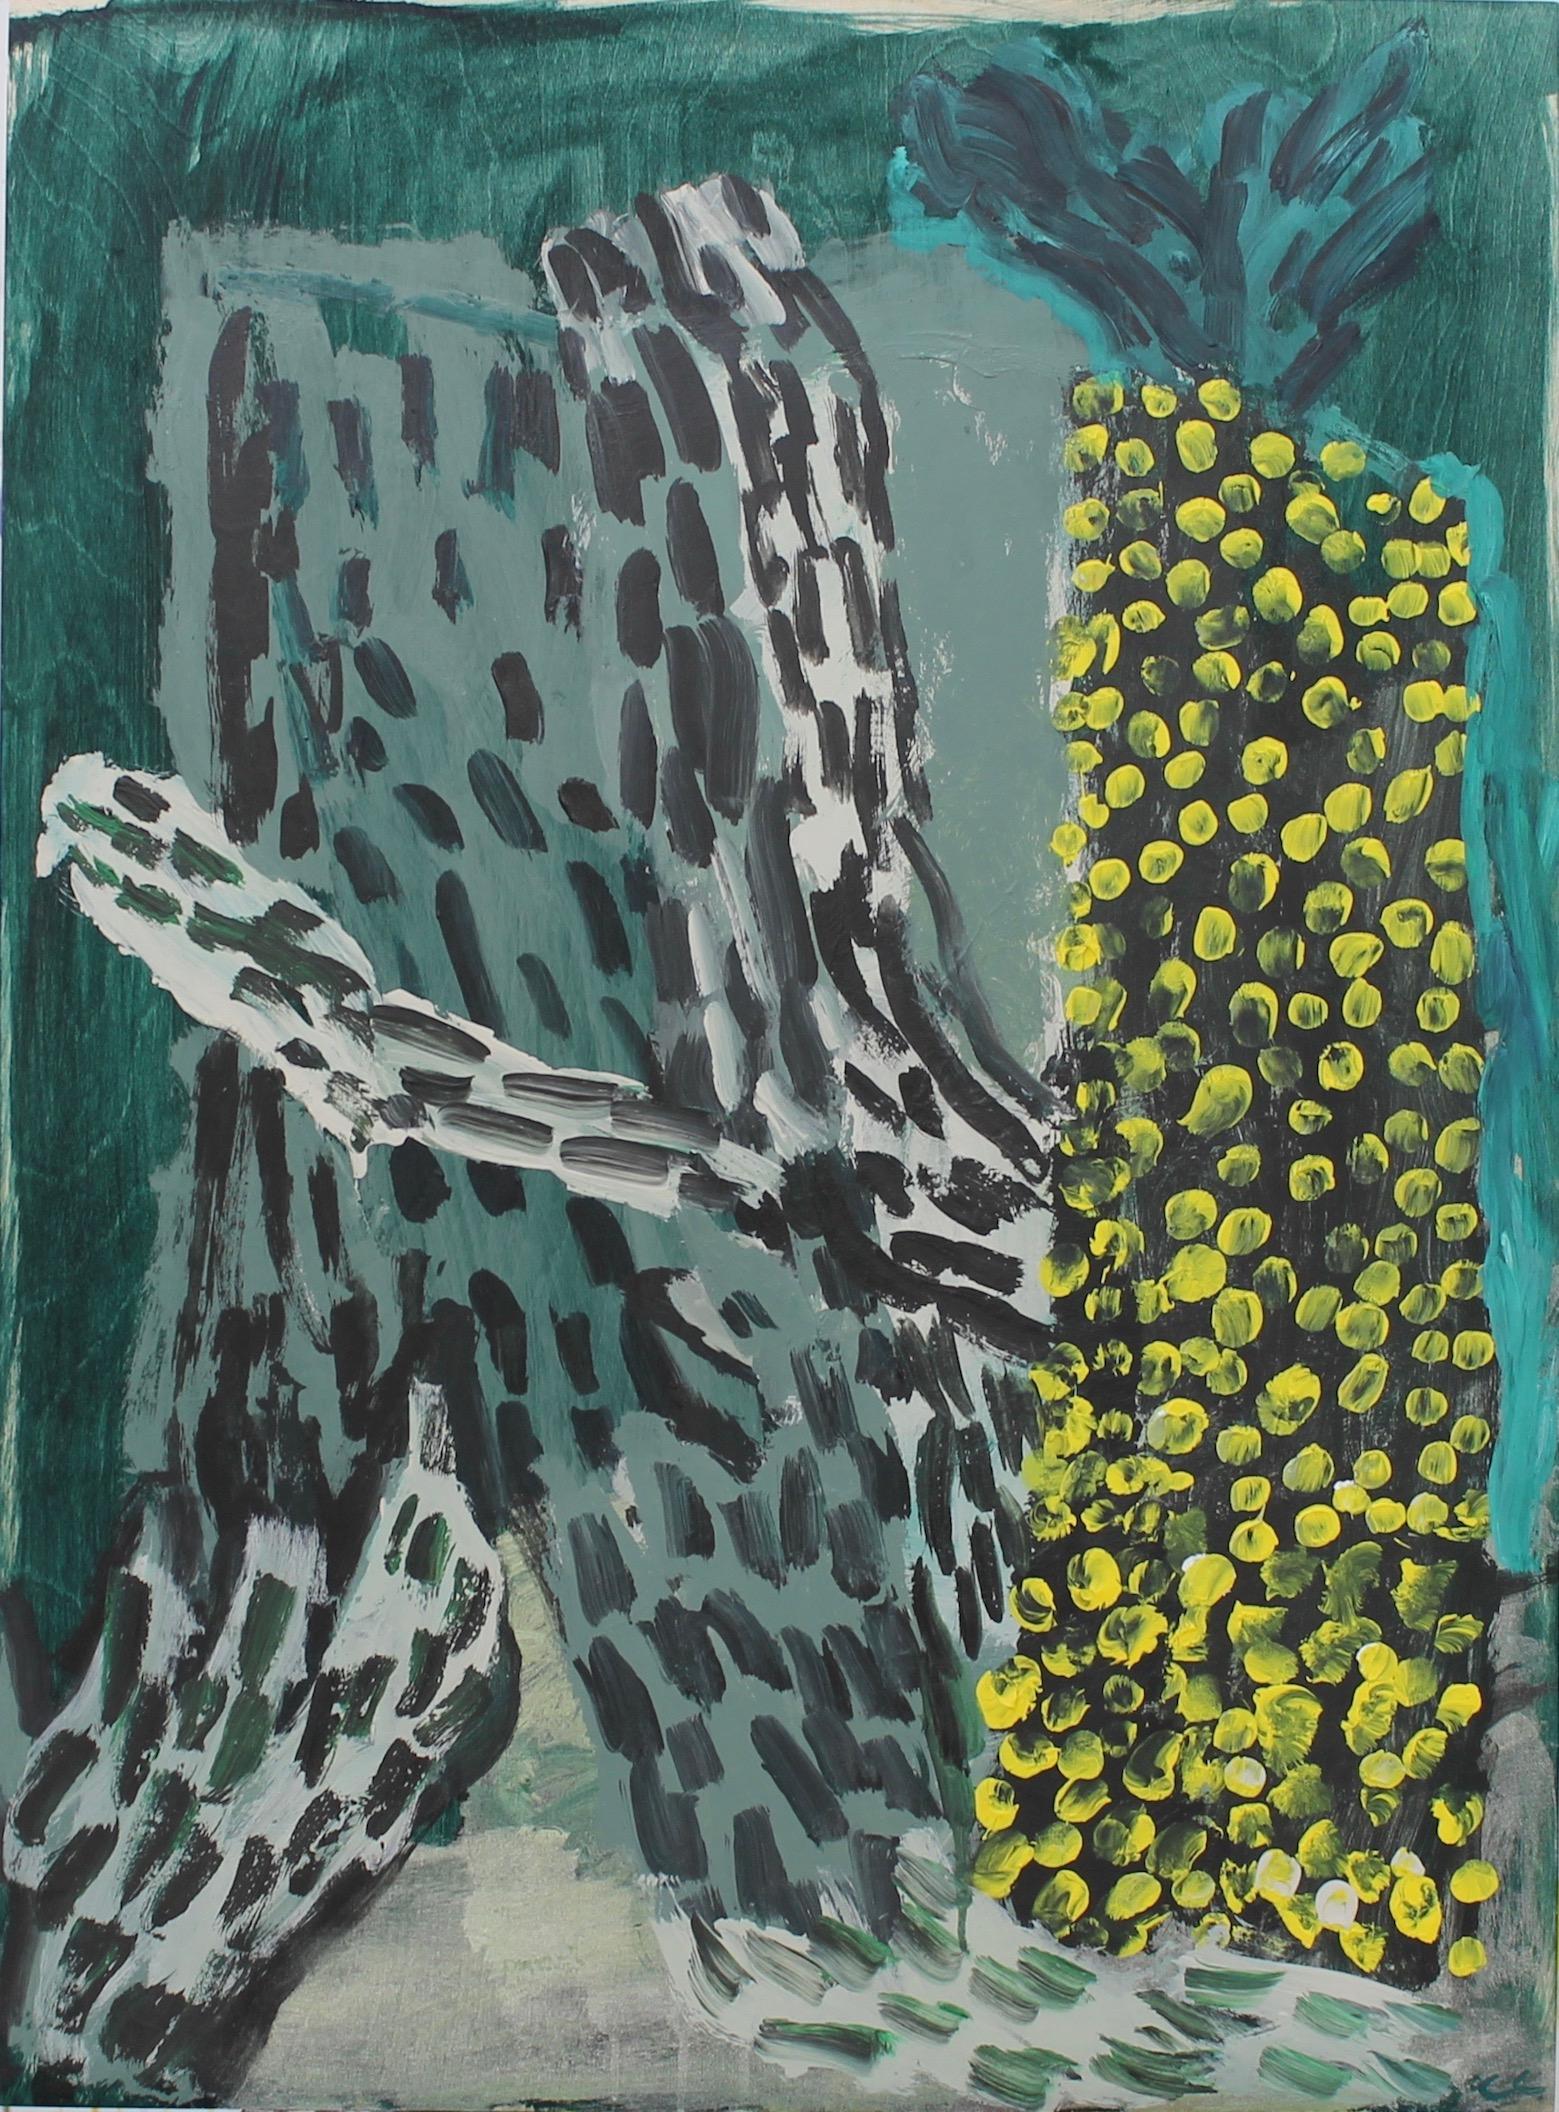 5. Neon palm 1 h76xw56cm vinyl birch panel by Catherine Cassidy